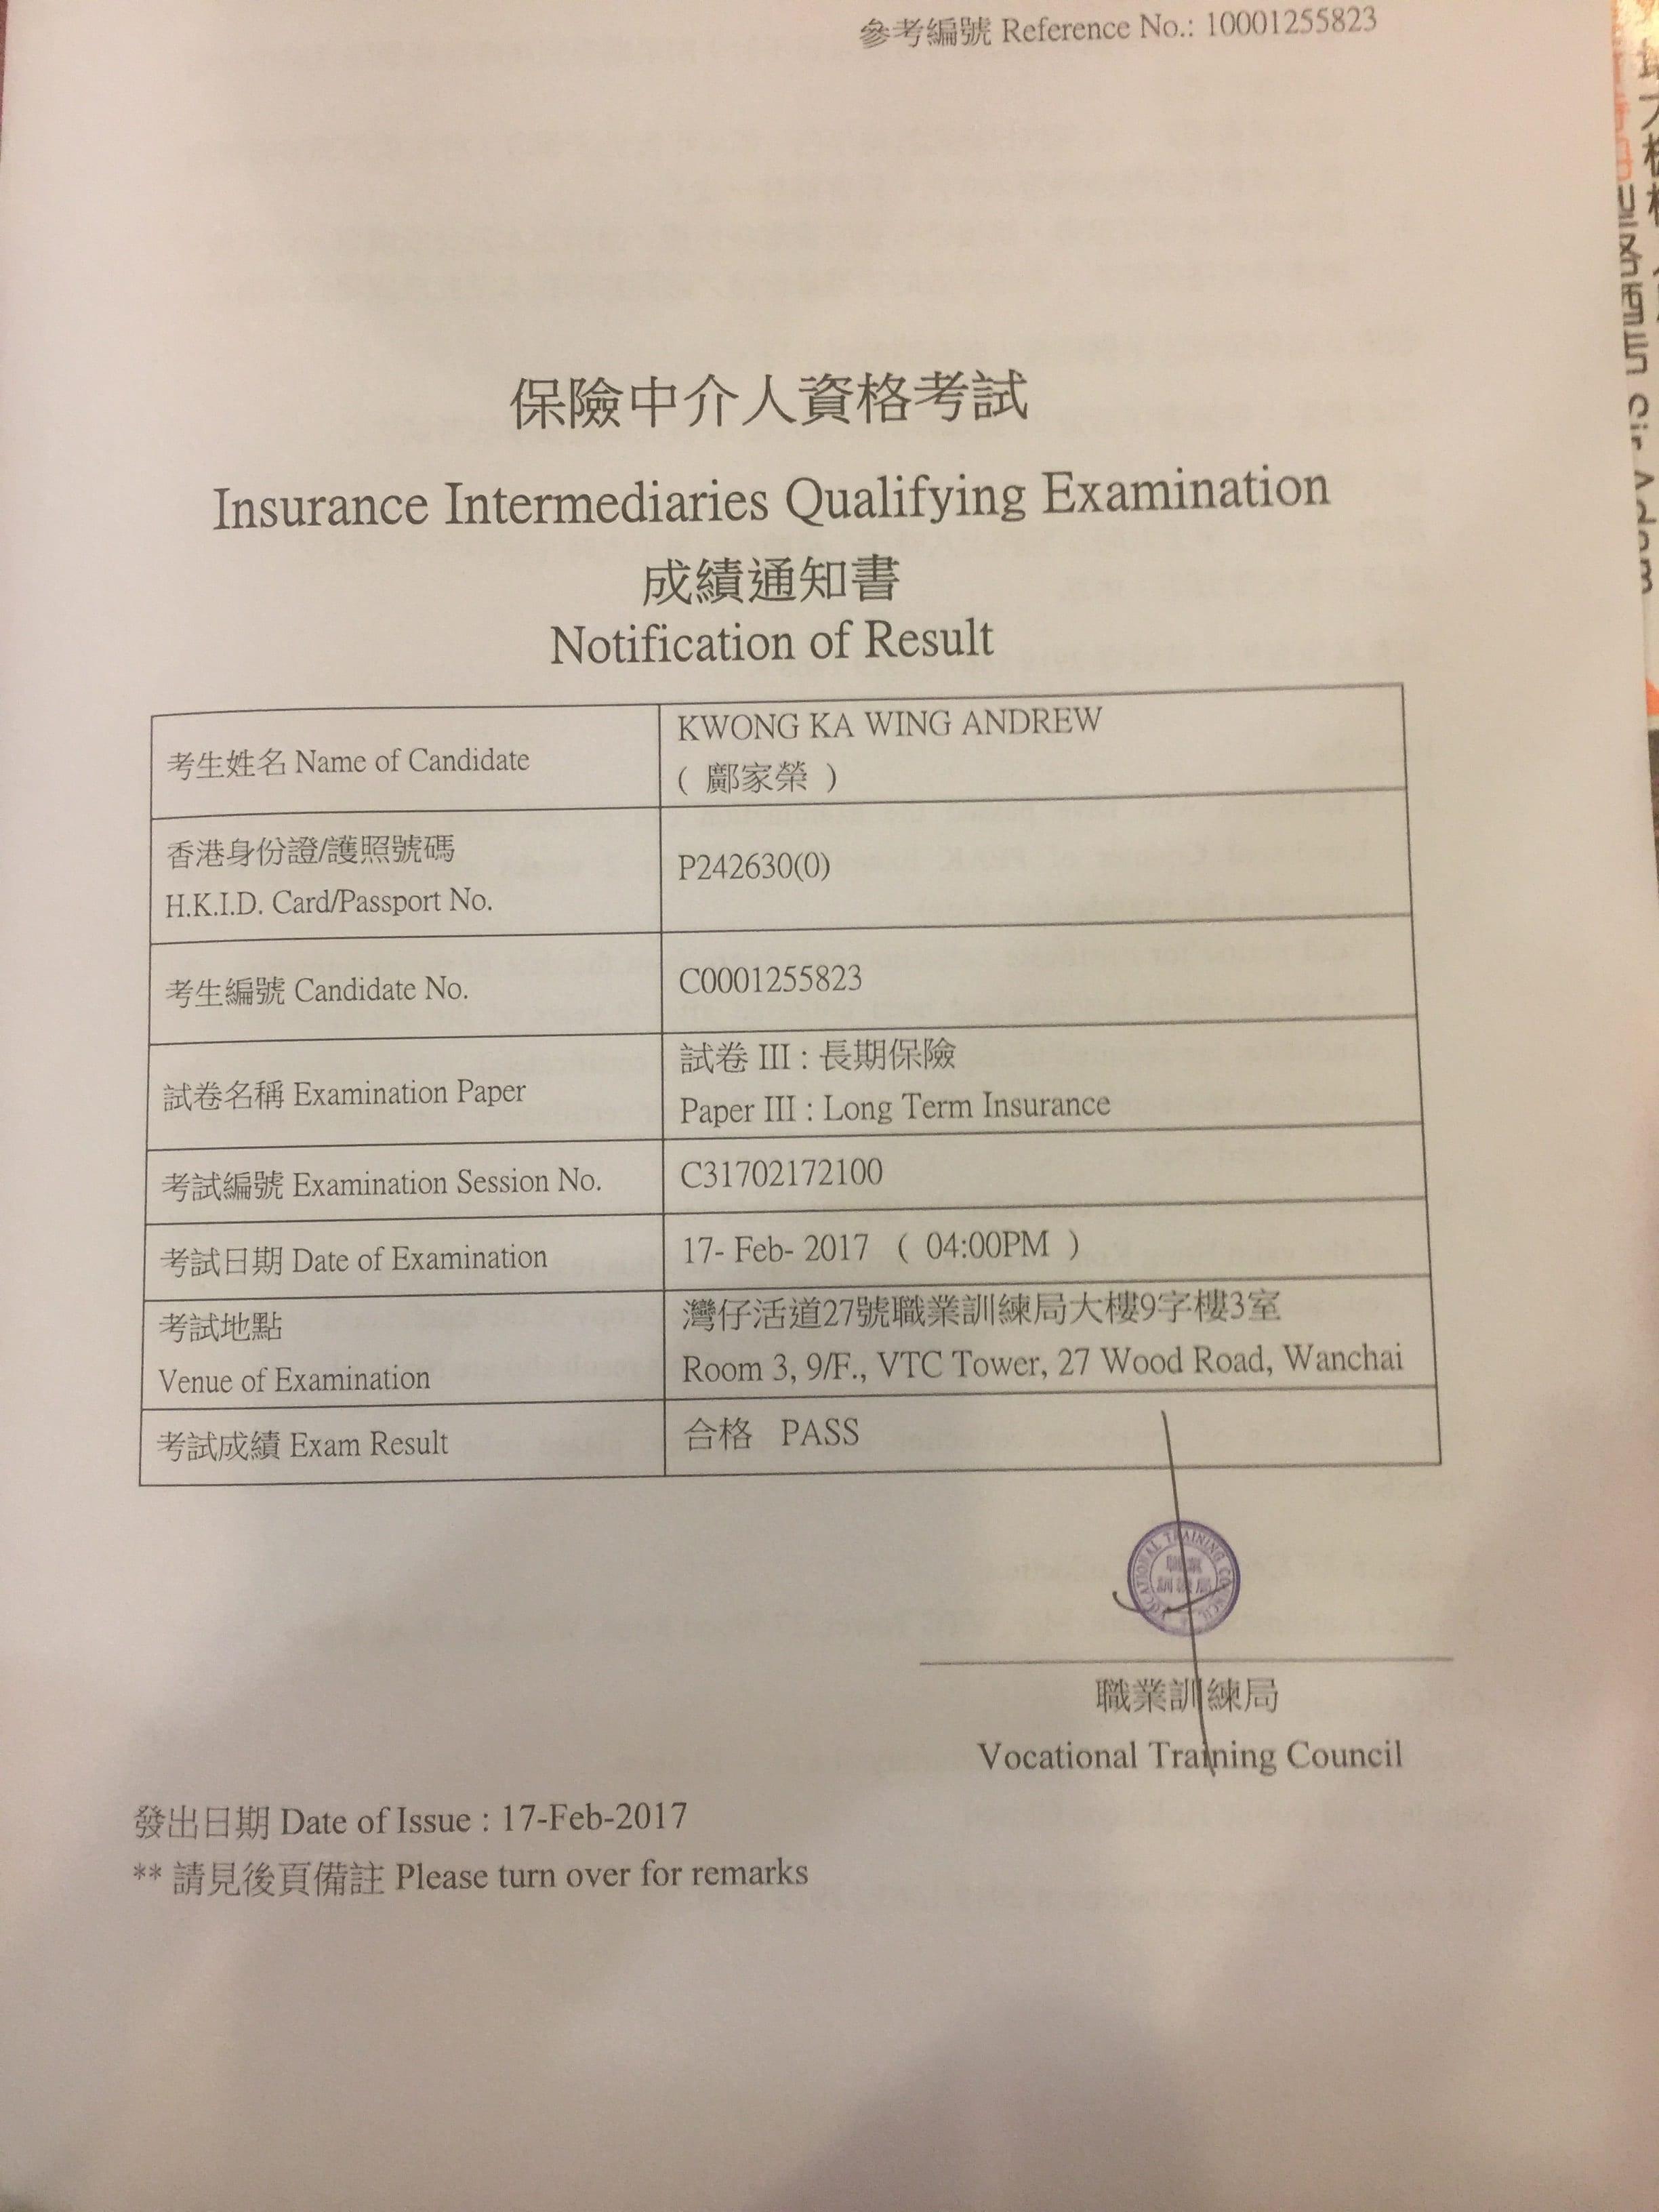 KWK 17/2/2017 IIQE Paper 3 保險中介人資格考試卷三 Pass